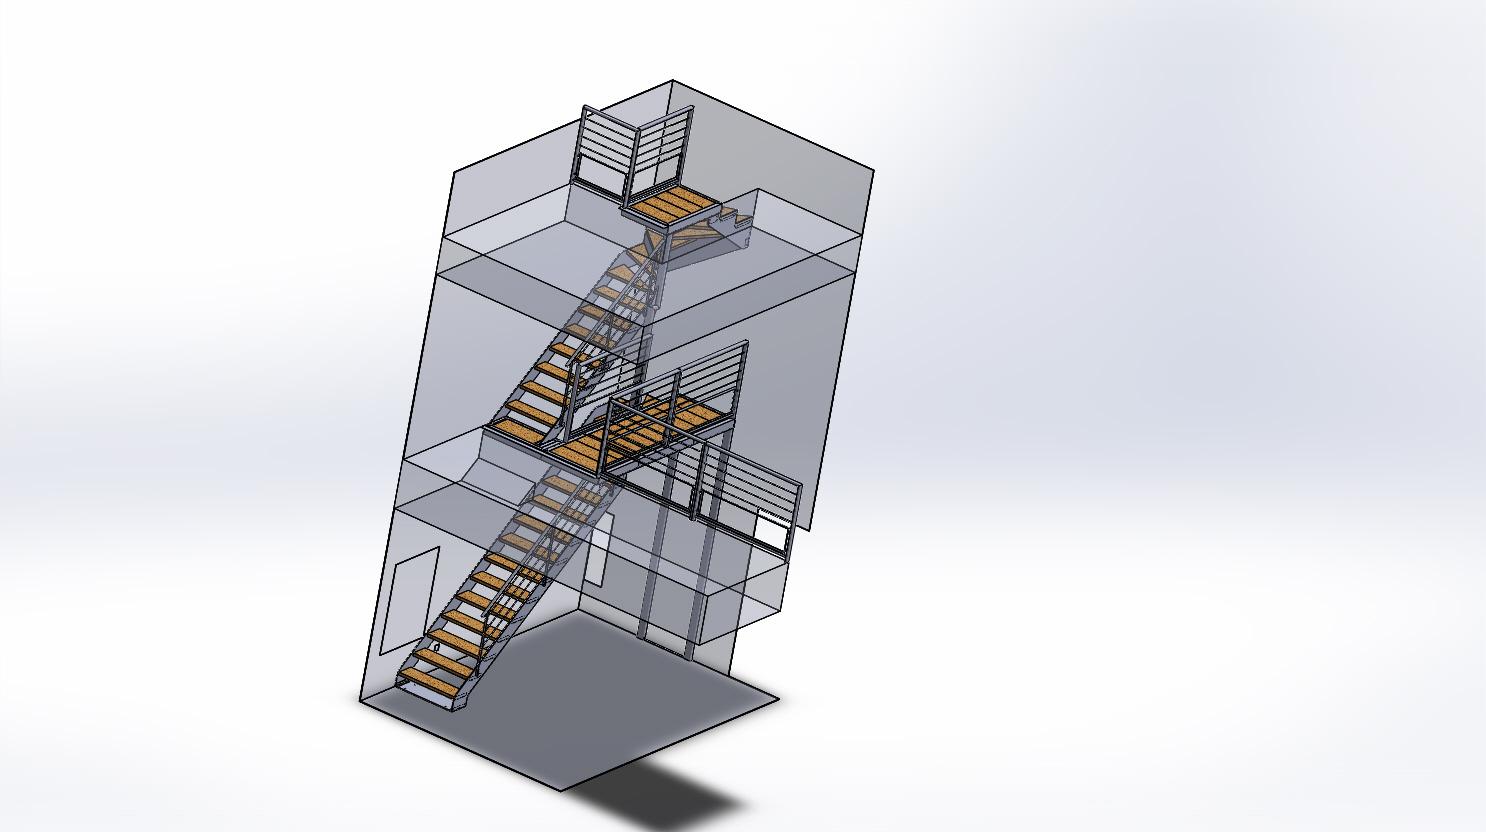 mezzanine m tal lyon mezzanine acier villefranche calade design. Black Bedroom Furniture Sets. Home Design Ideas